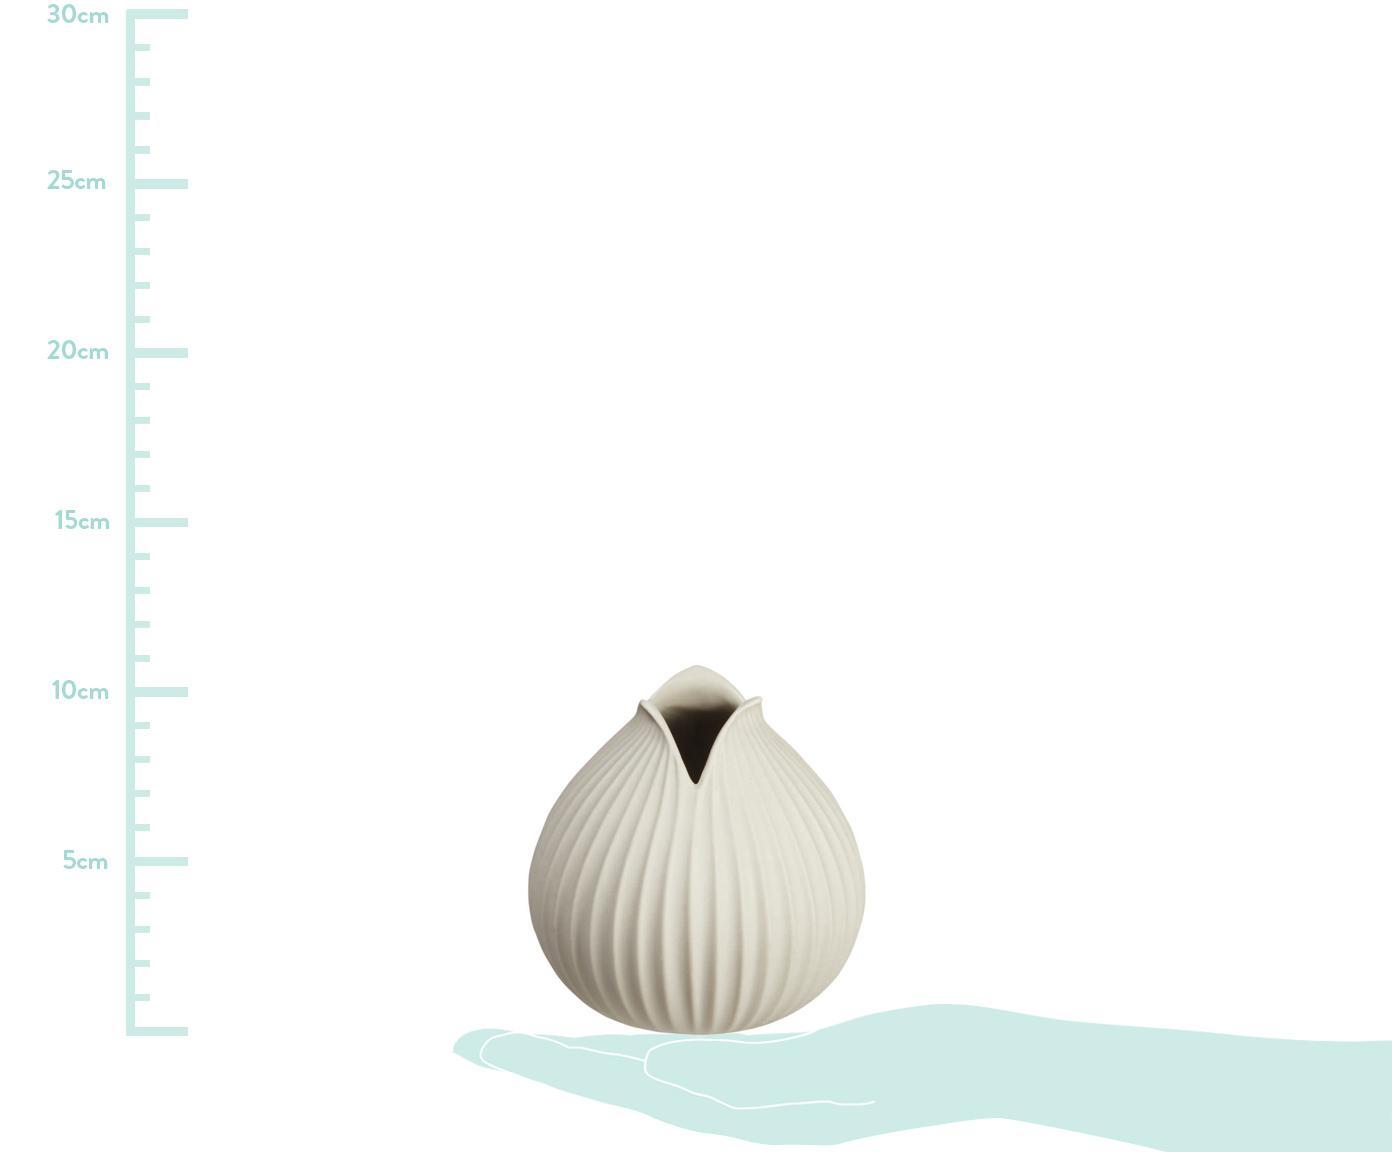 Handgefertigte Vase Yoko aus Porzellan, Porzellan, Beige, Ø 15 x H 22 cm